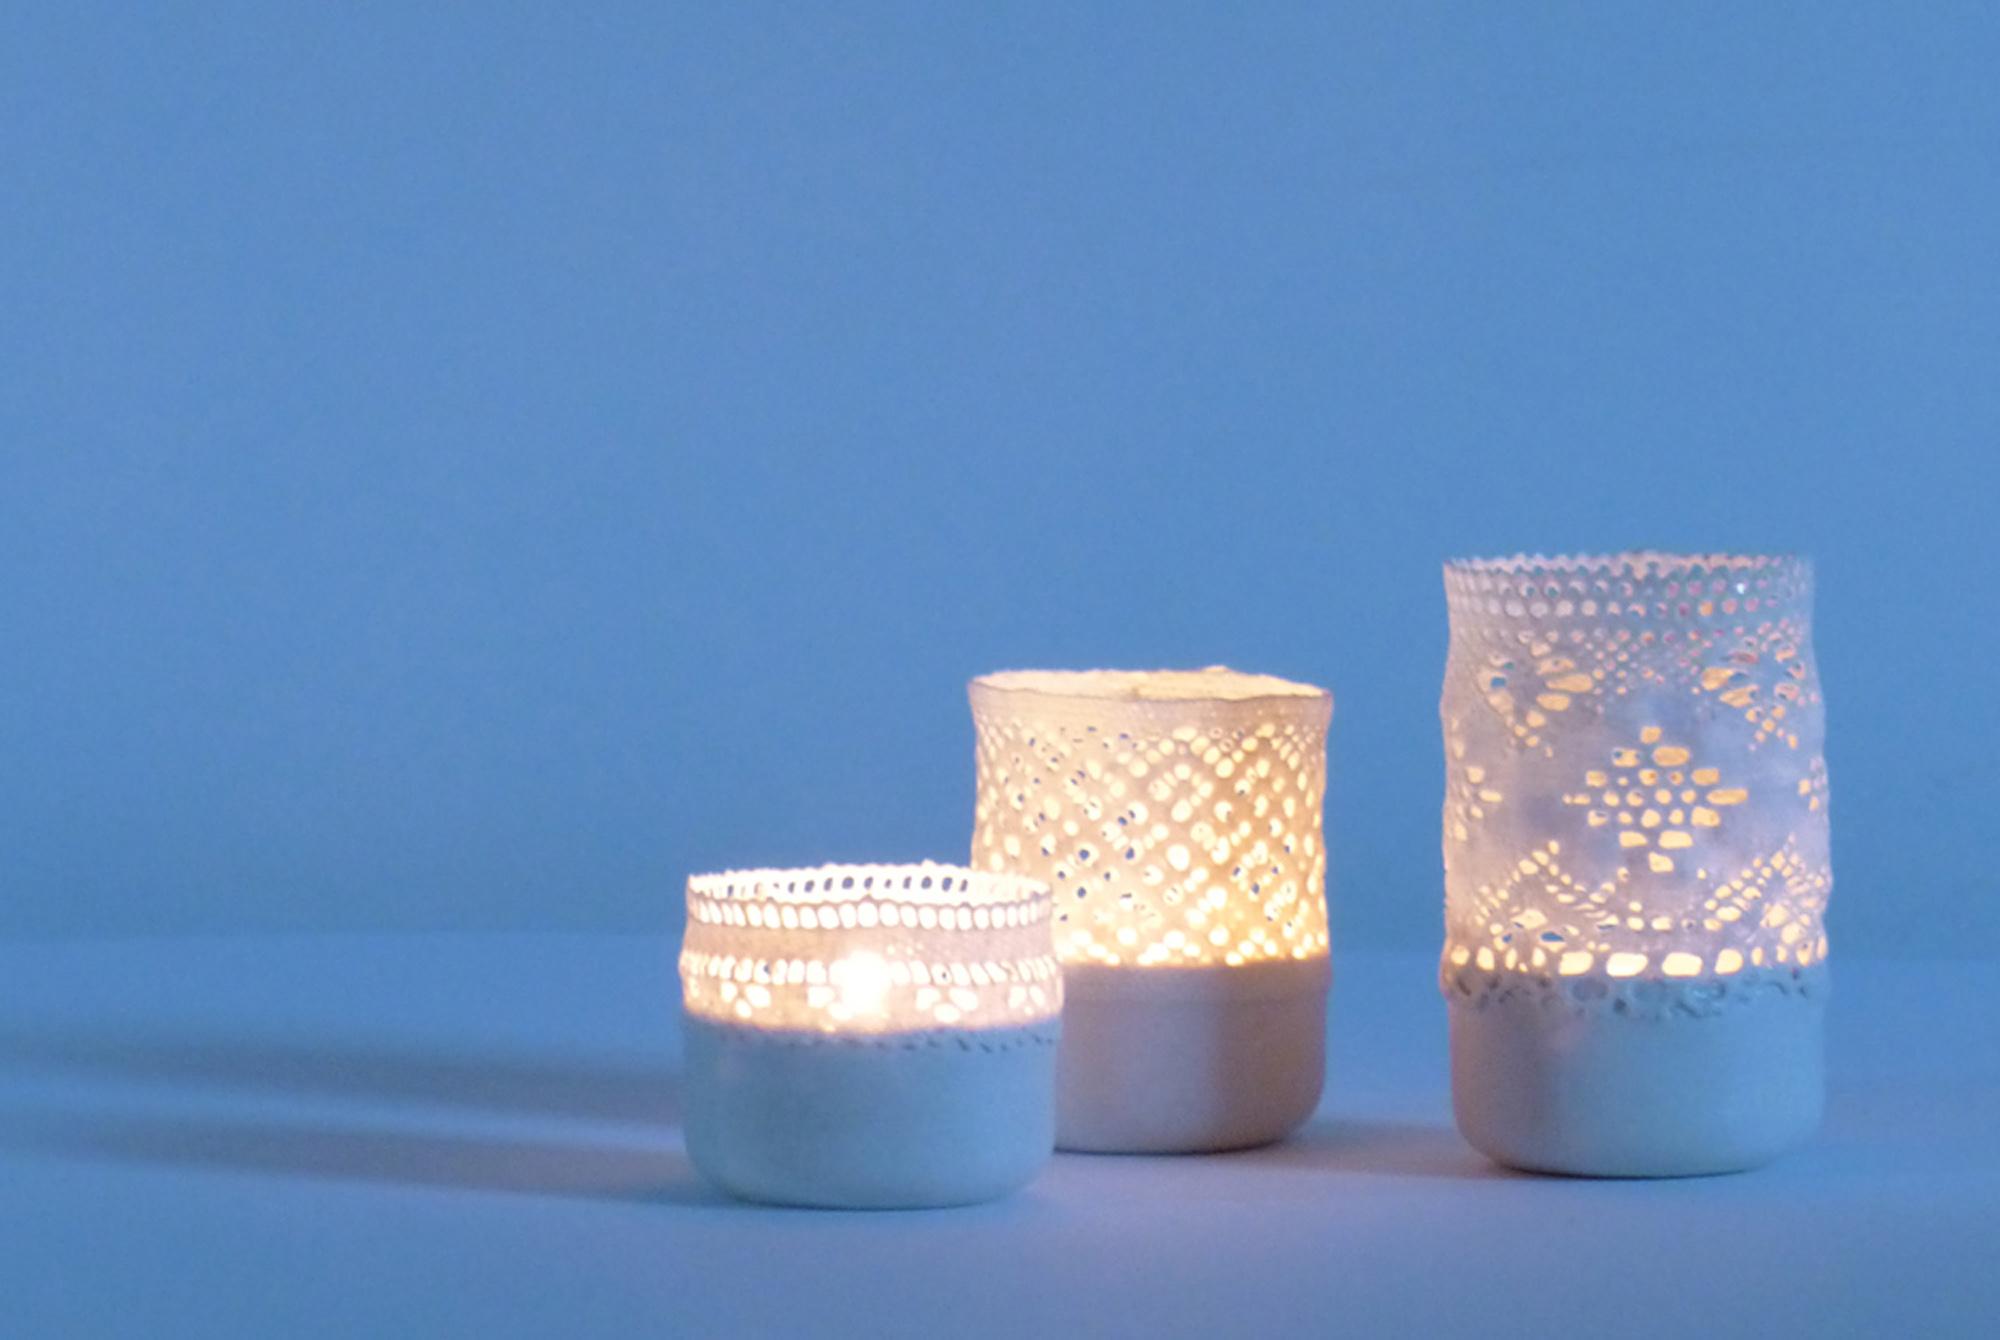 minicollection-tealights-b-studiokryszewski.jpg